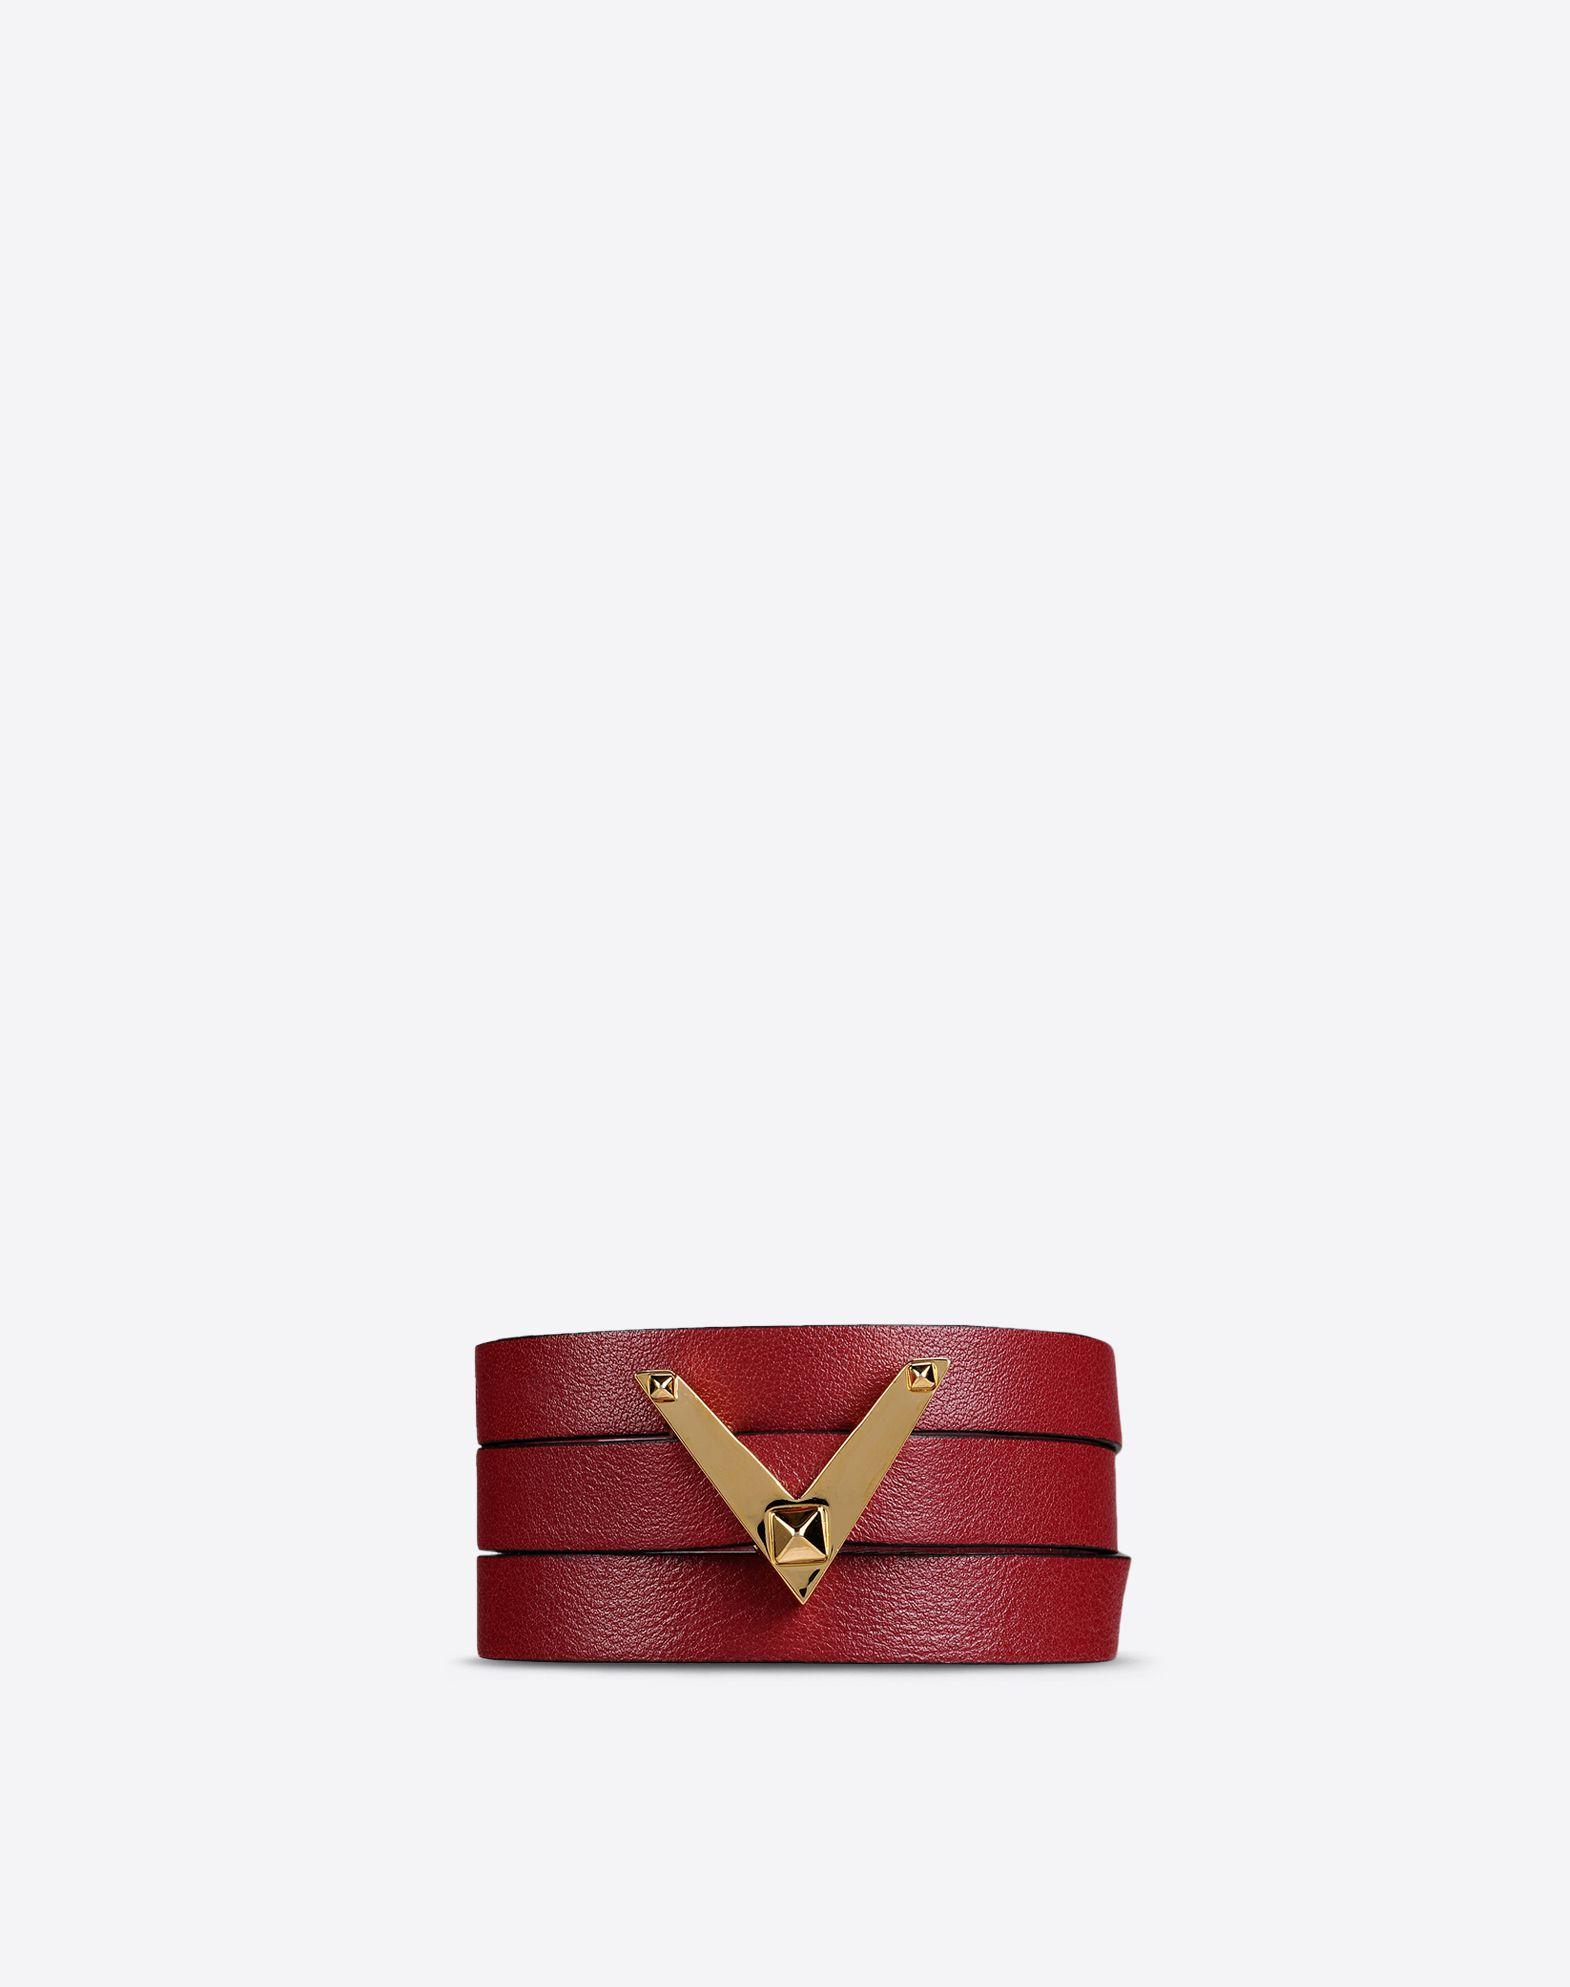 VALENTINO Logo detail Solid color Metallic buckle closure  50170927we